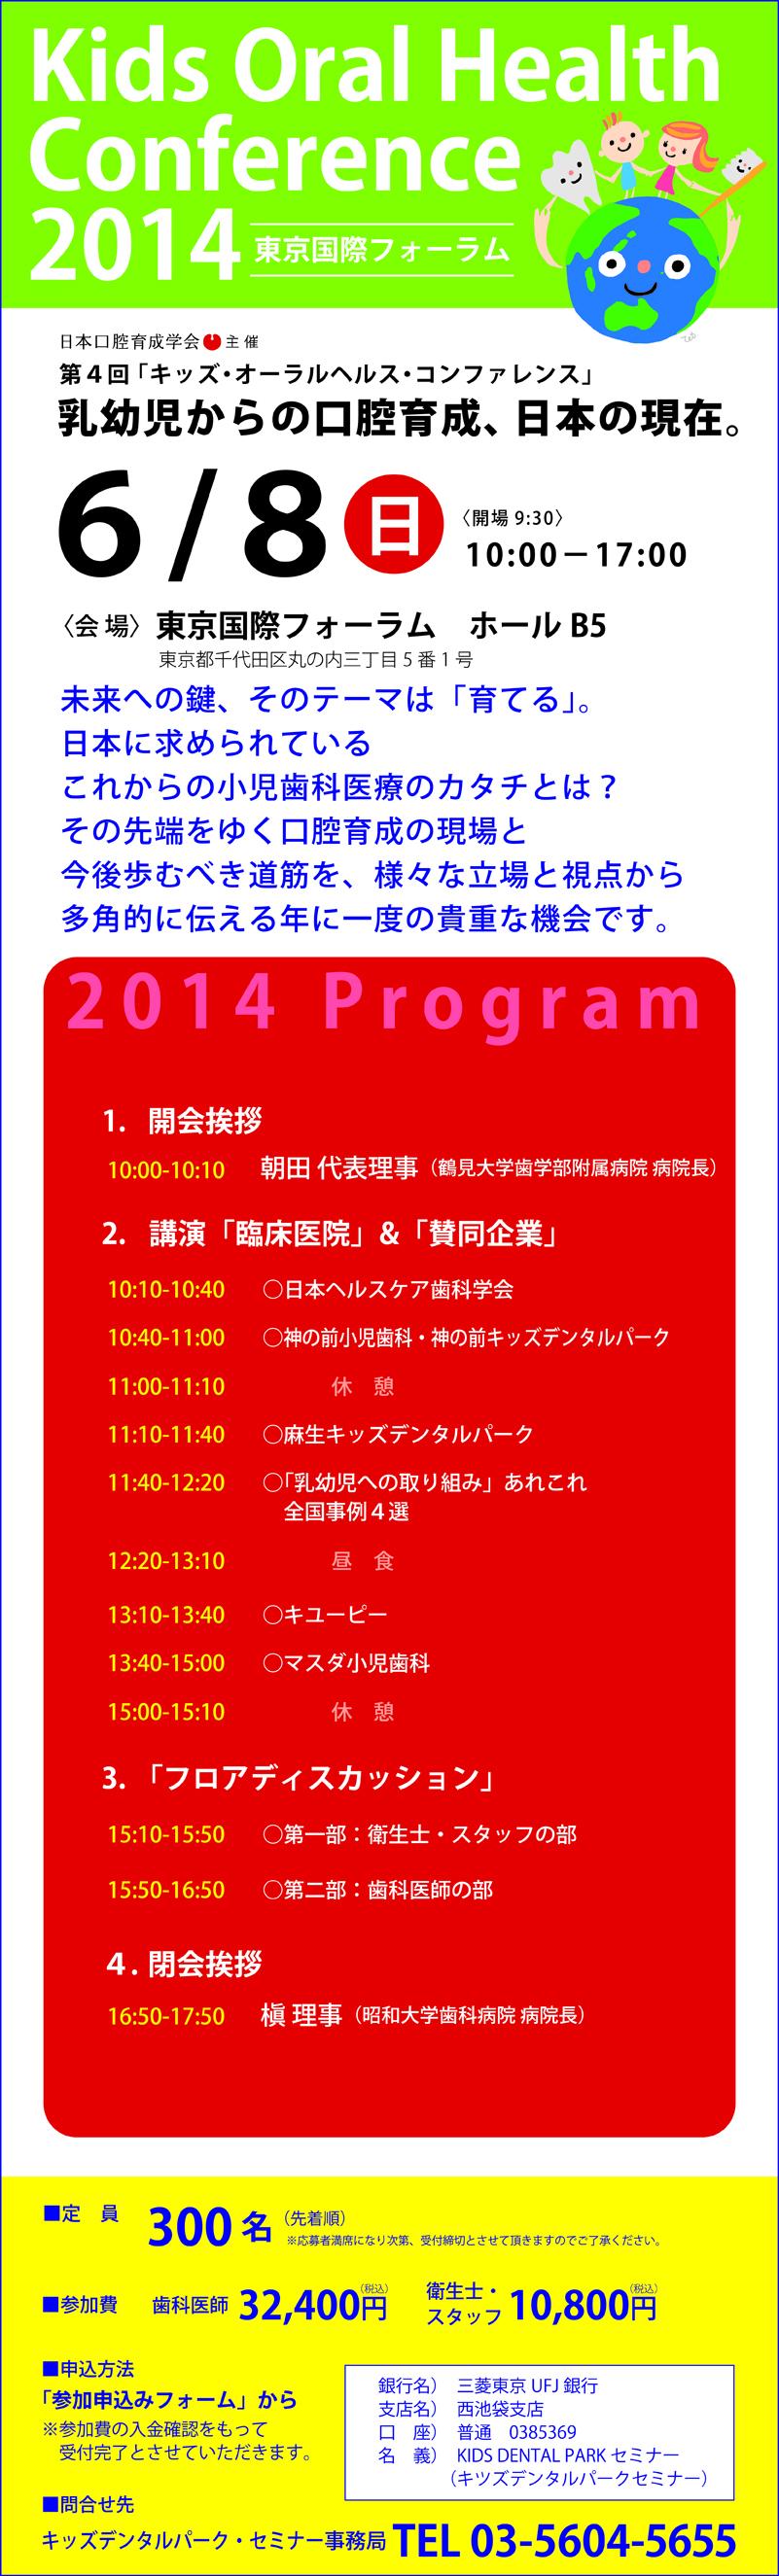 Kisd Oral Health Conference 2014 詳細